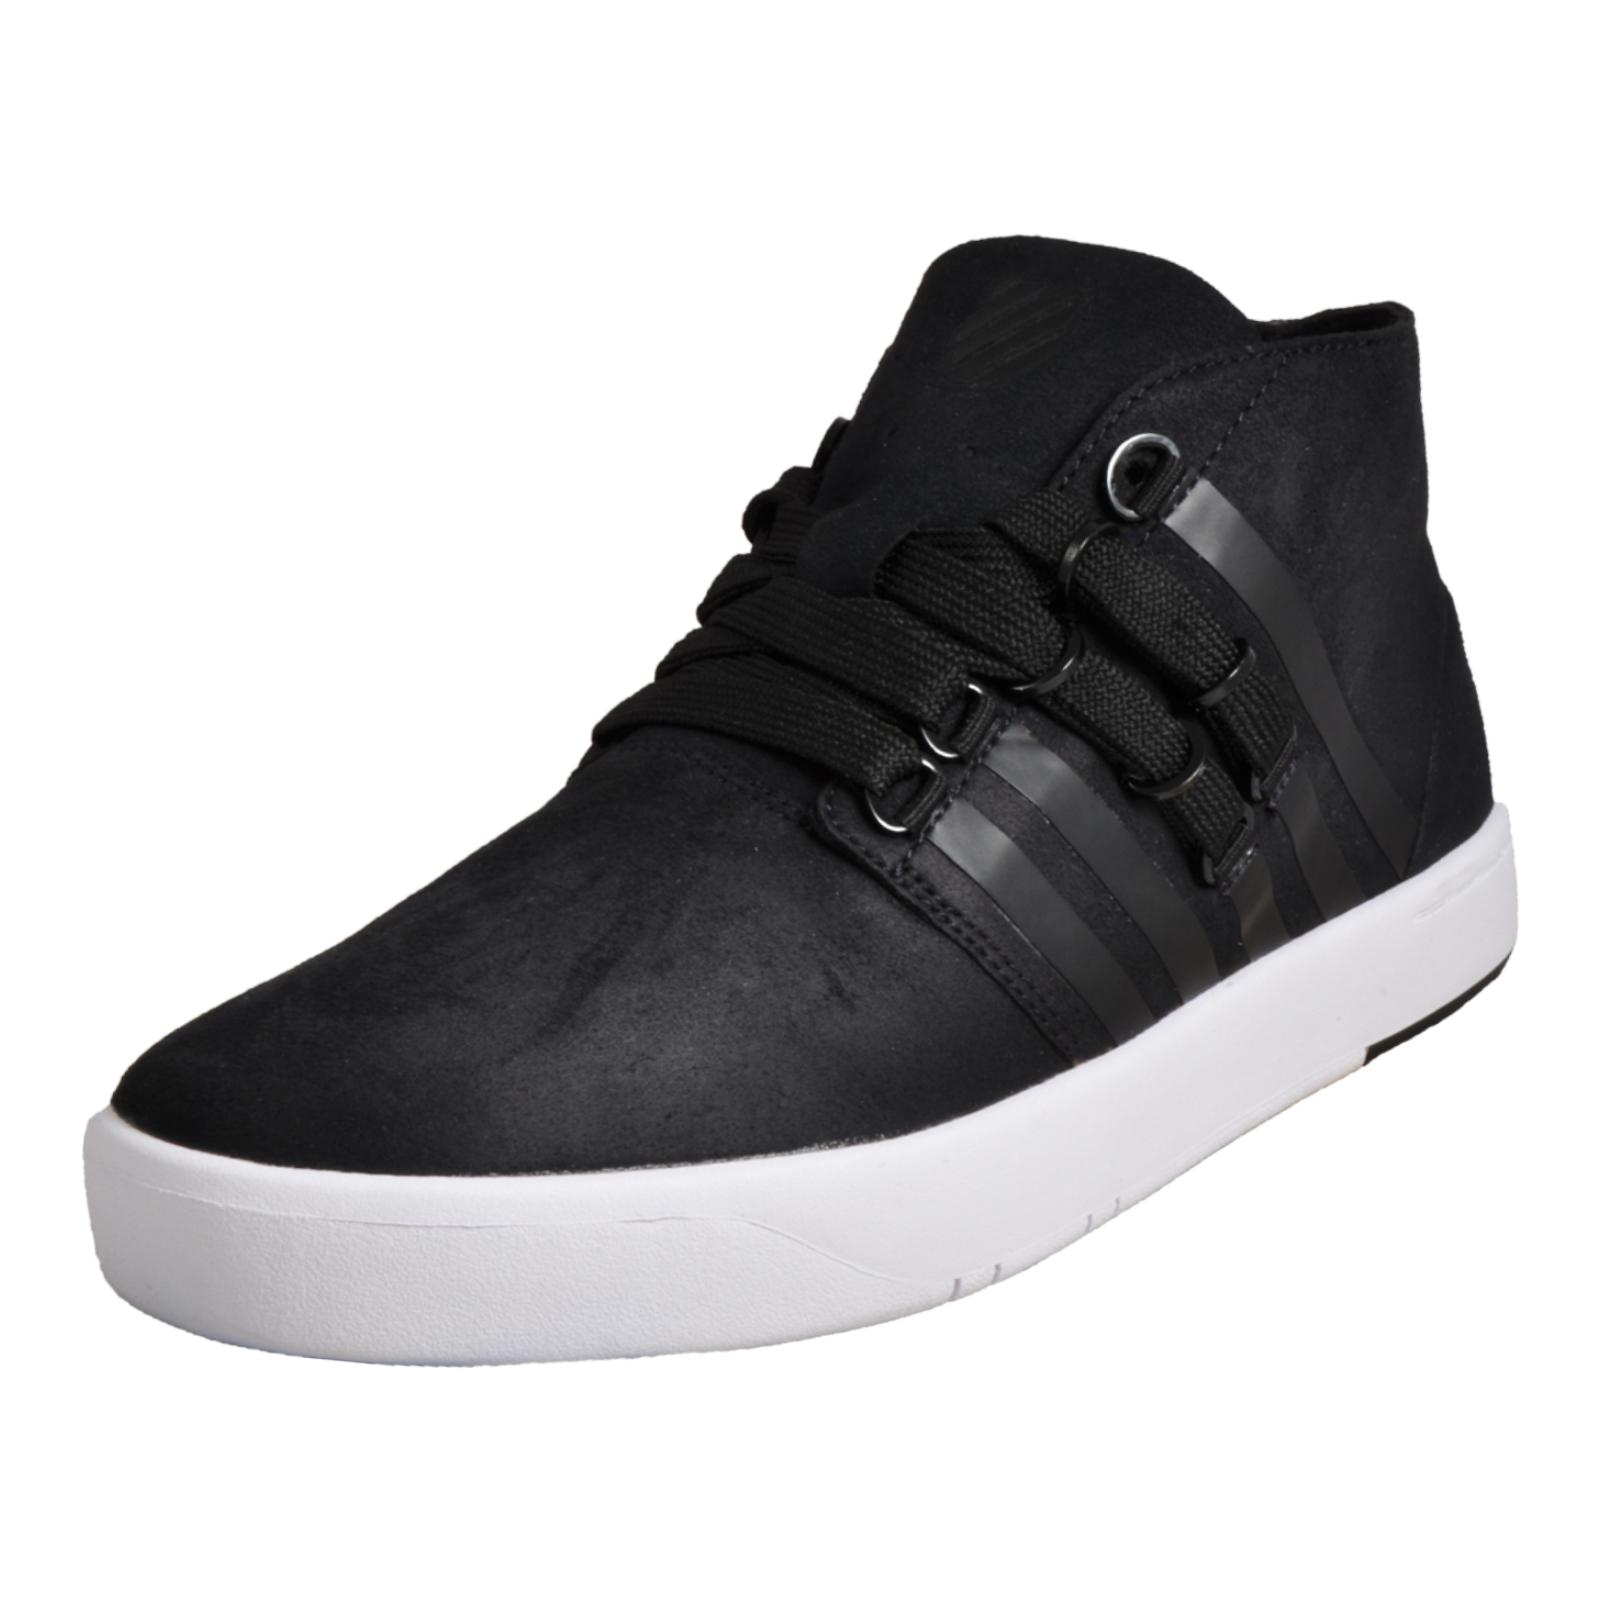 56937f0ff6056 K Swiss D R Cinch Chukka Mens Classic Casual Fashion Sneaker Desert Boot  Black